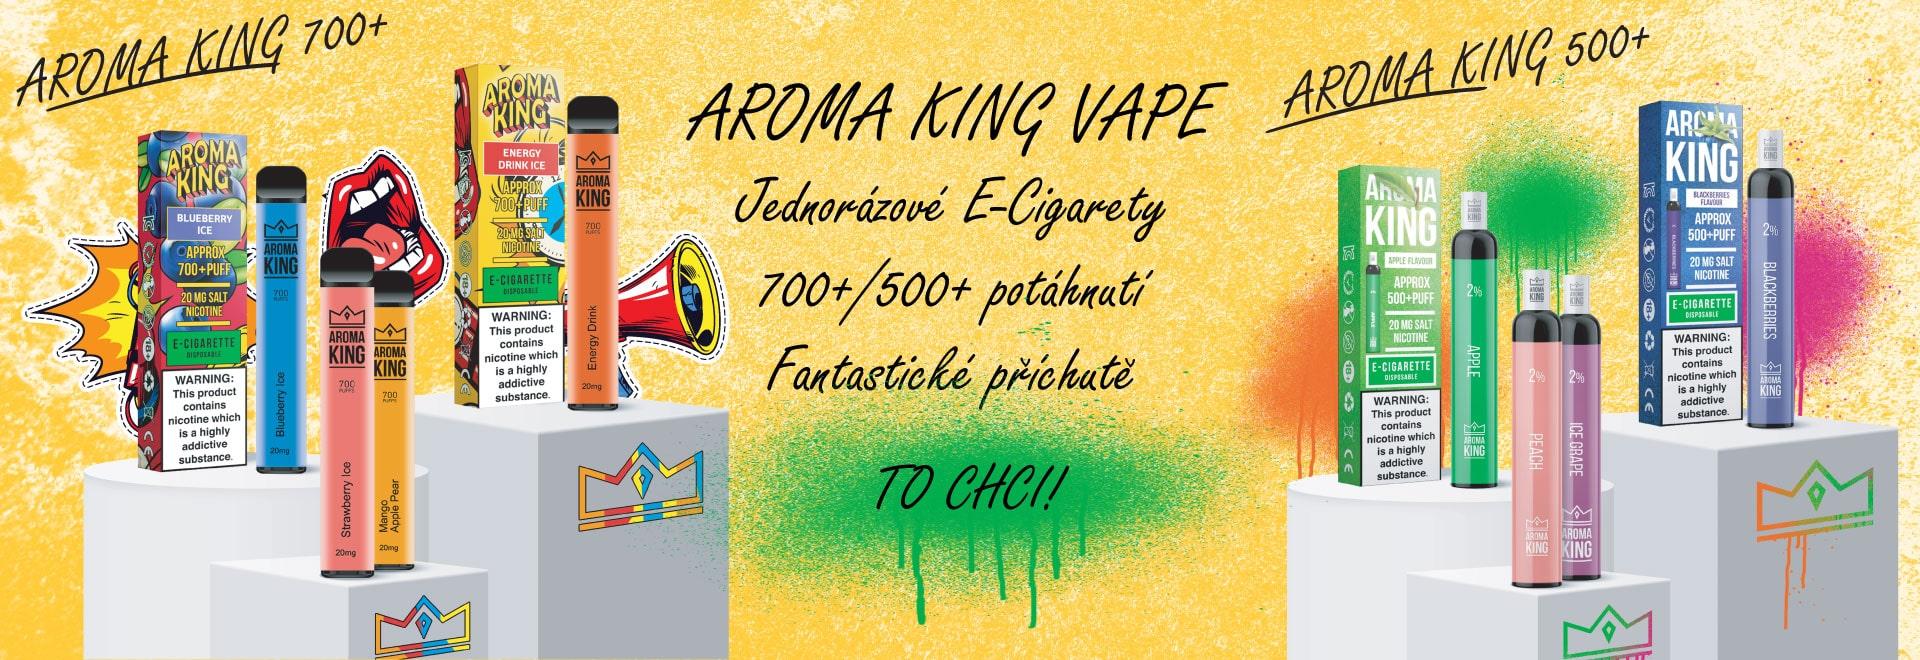 Aroma King E-cigarety